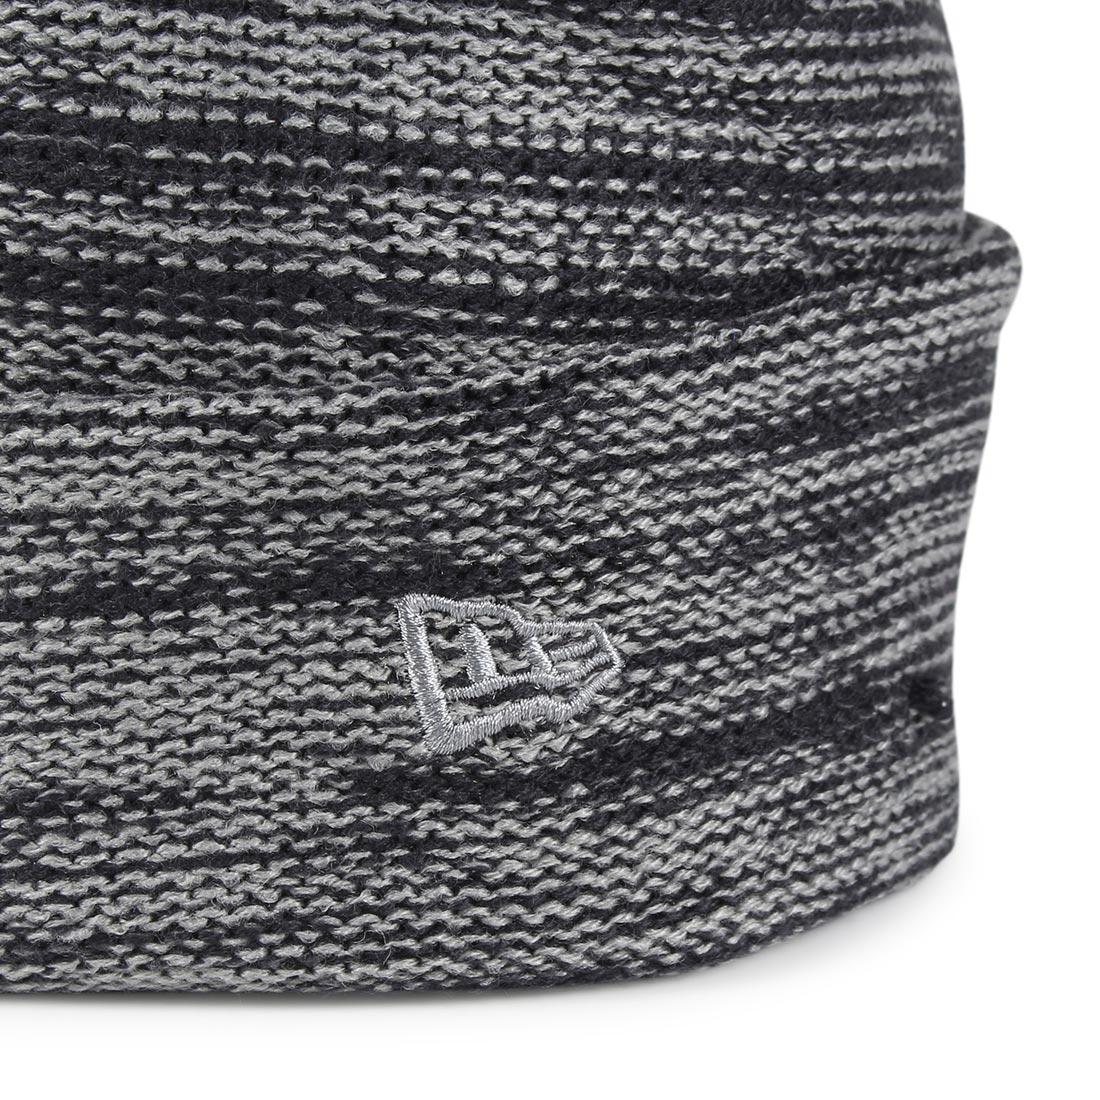 2c0e754473225 New Era Atlanta Braves Marl Knit Beanie - Navy / Storm Grey